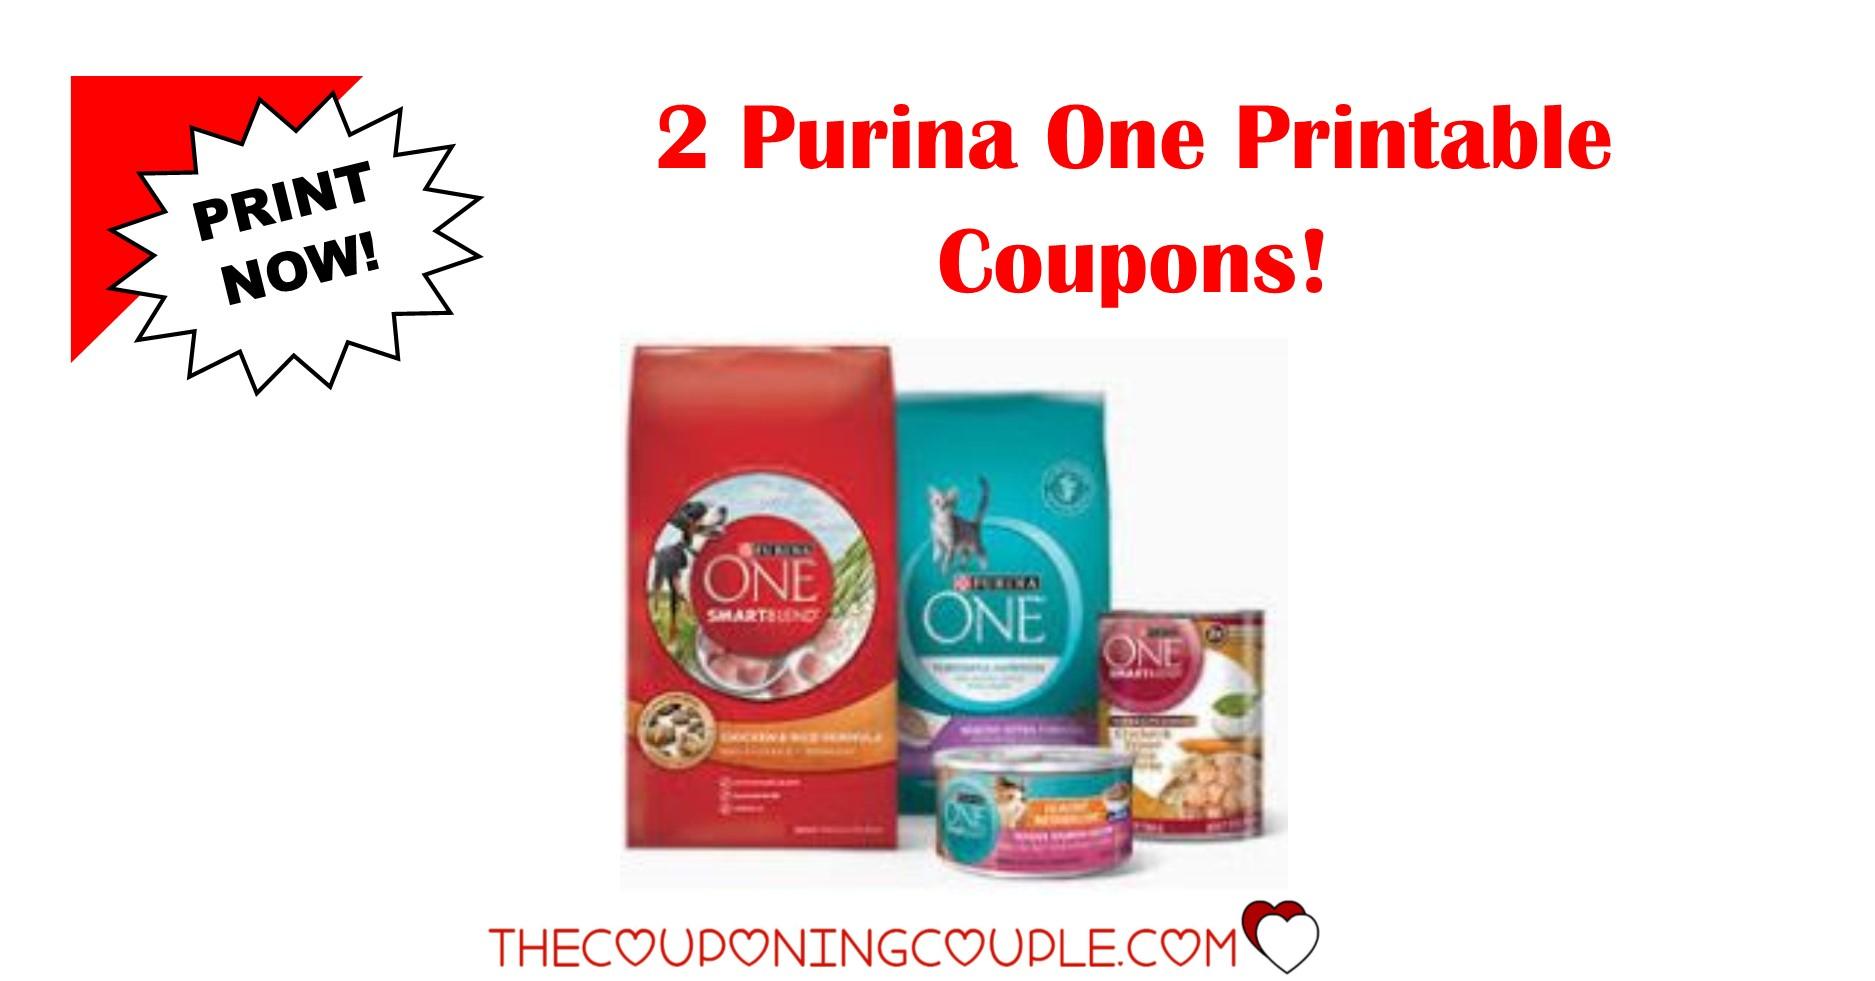 2 Purina One Printable Coupons ~ Both Coupons Are B1G1! - Free Printable Coupons For Food